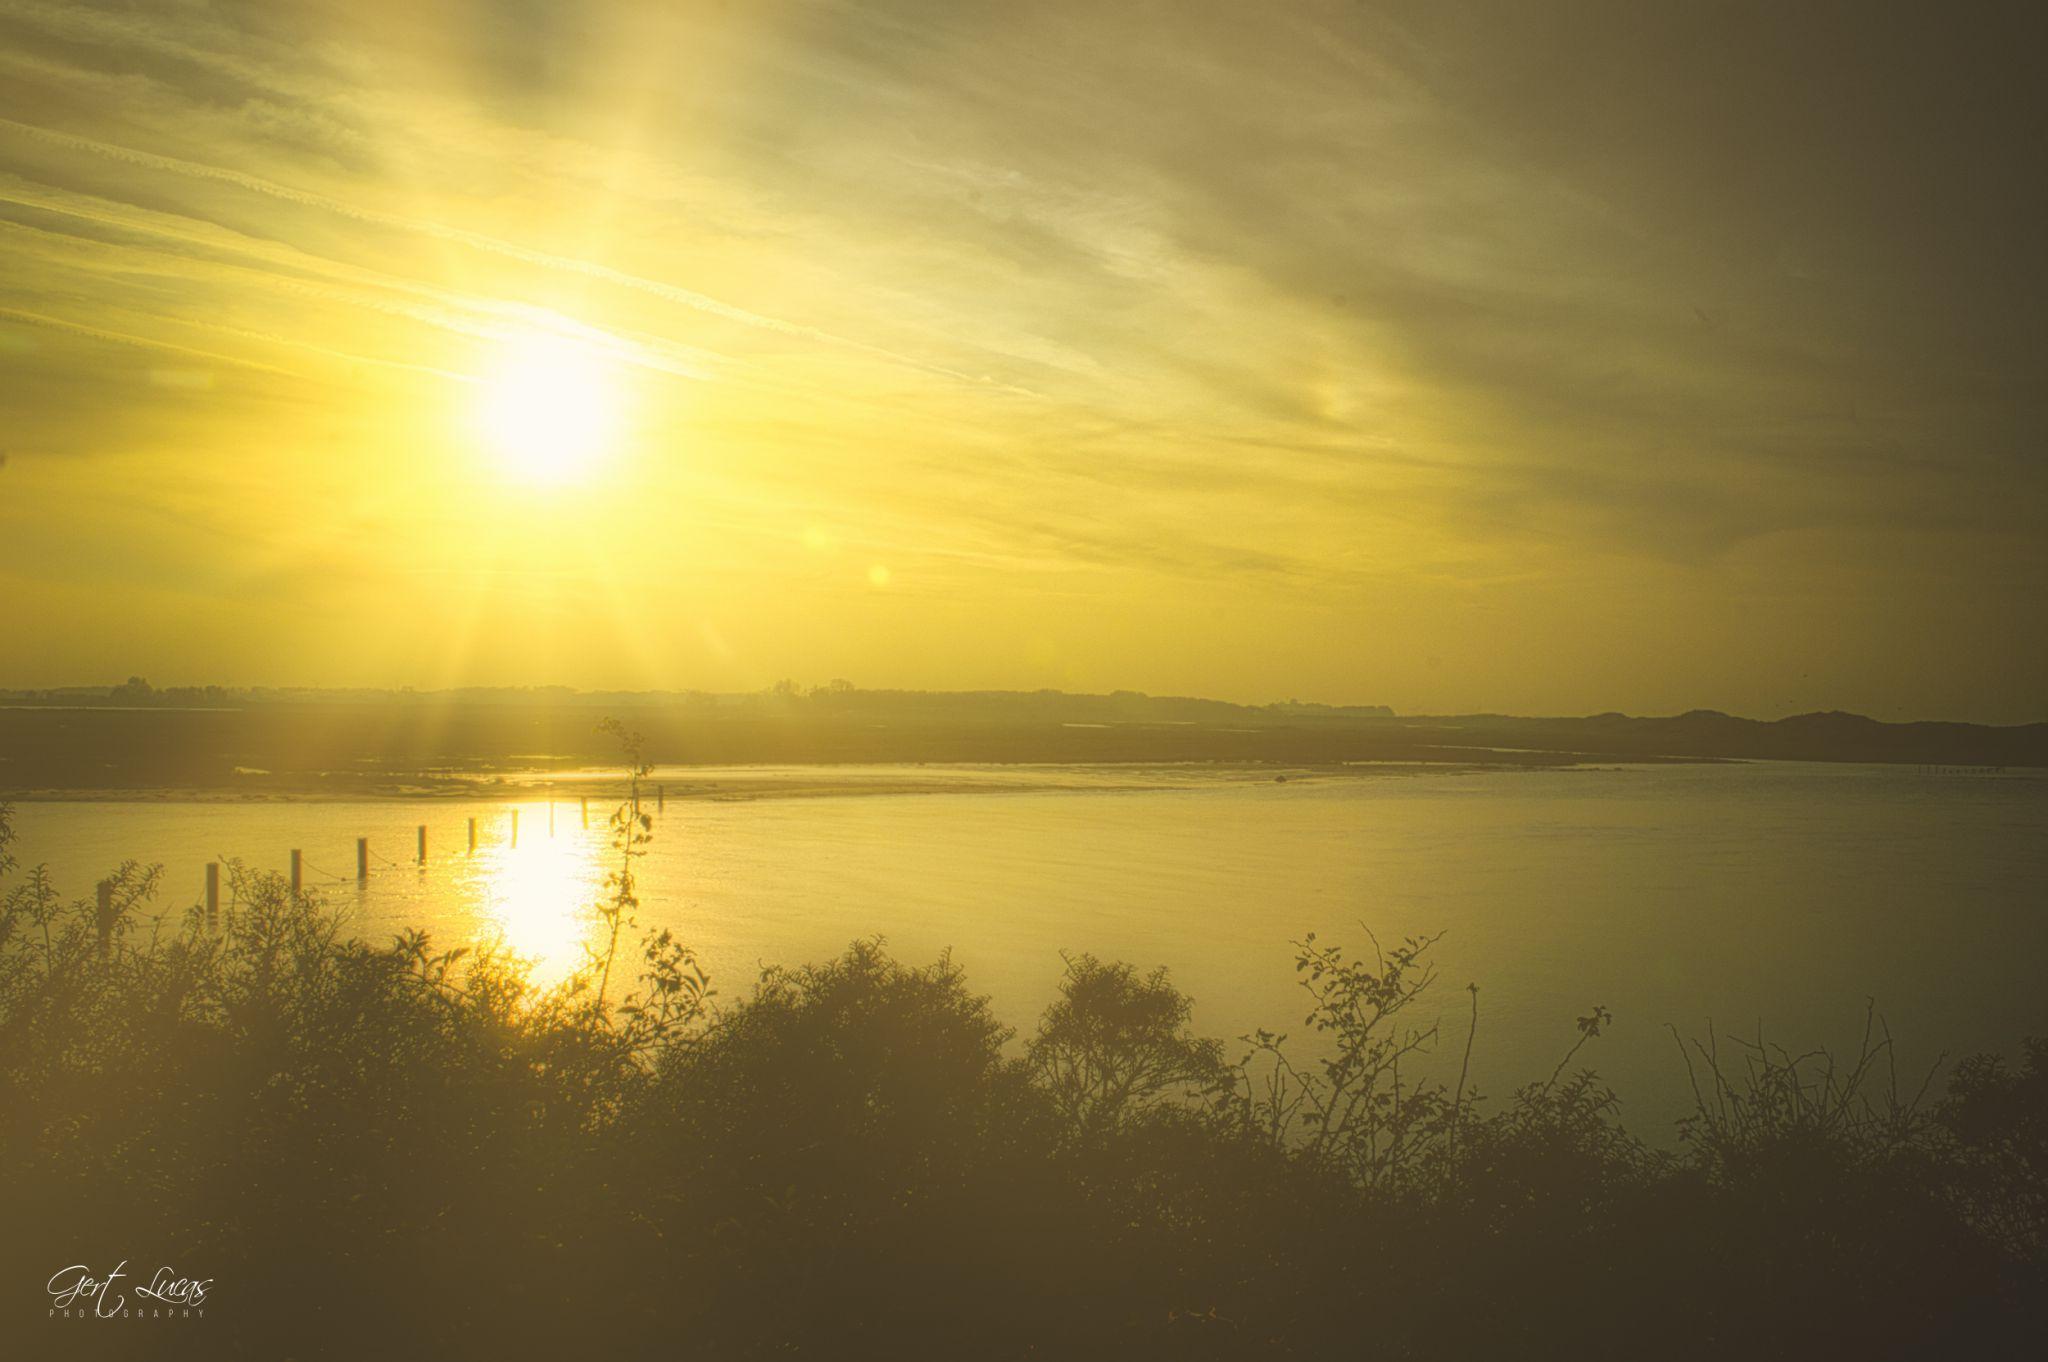 Zwin sunset, Netherlands